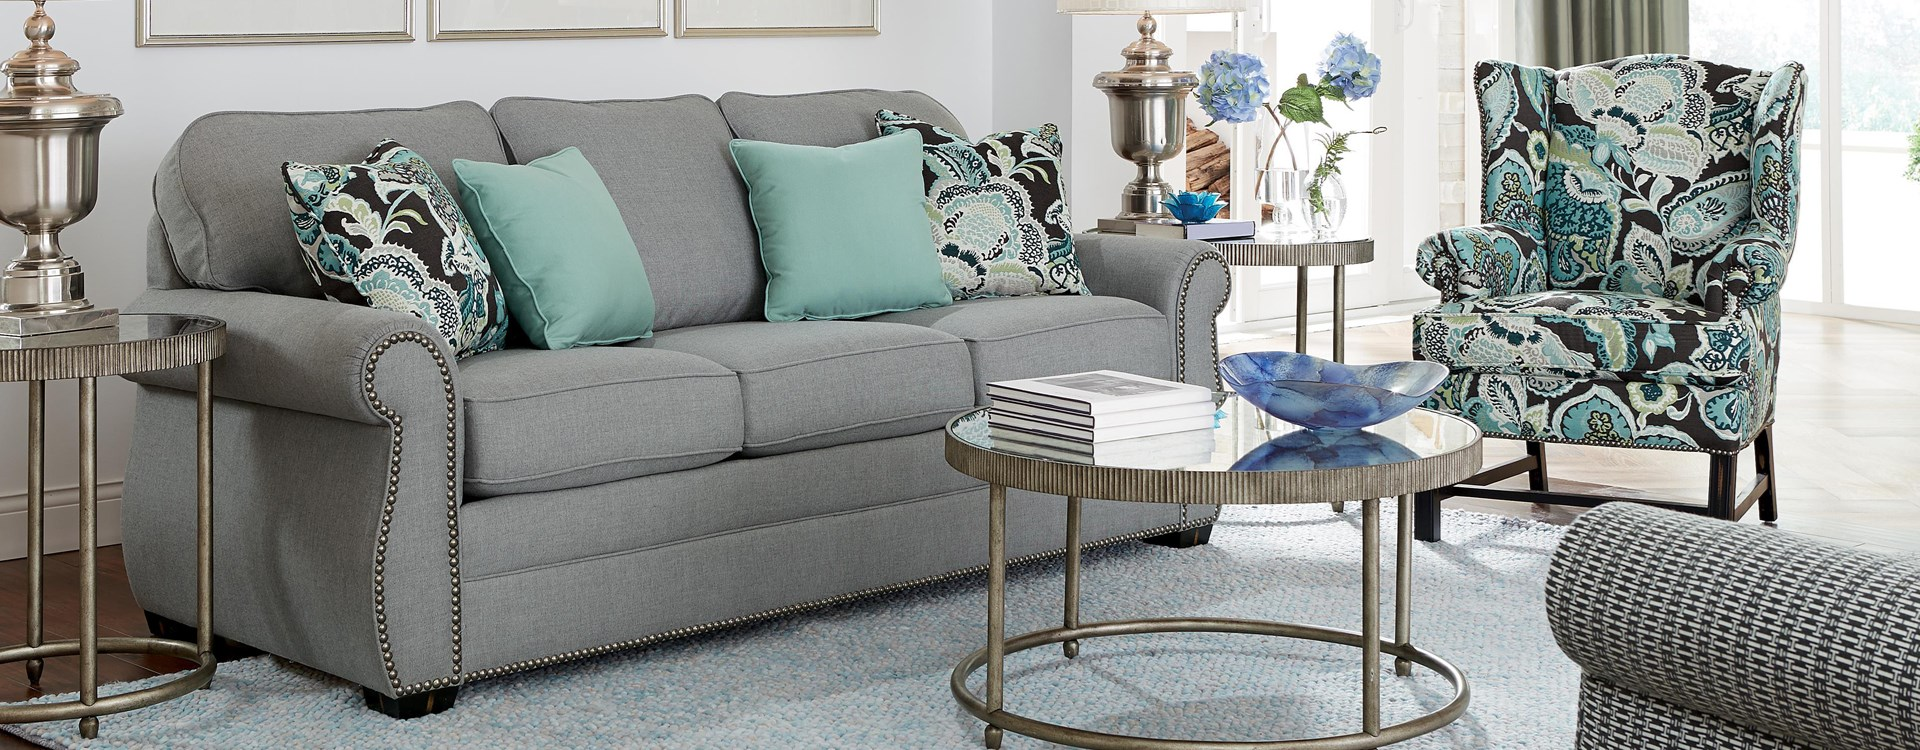 Louis Mohana Furniture Houma Thibodaux New Orleans Bourg